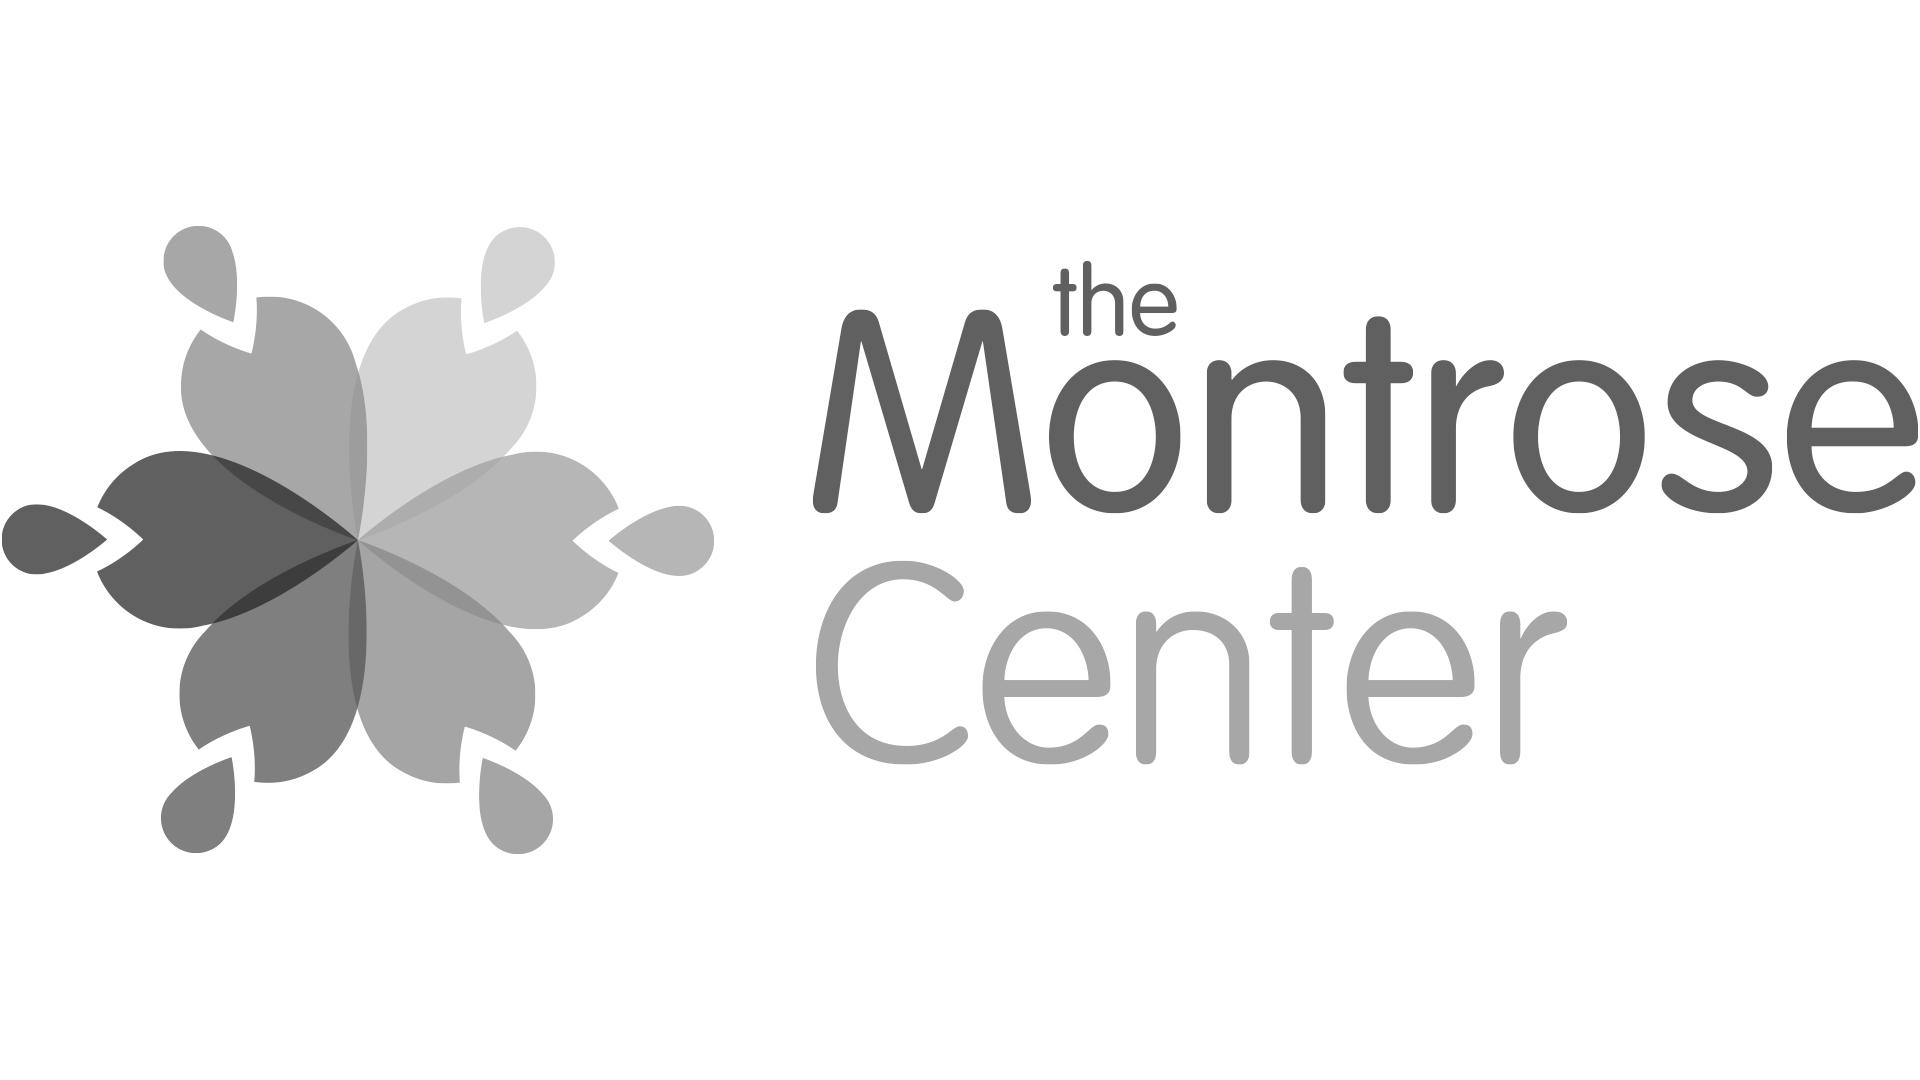 The Montrose Center_Partner_1920x1080